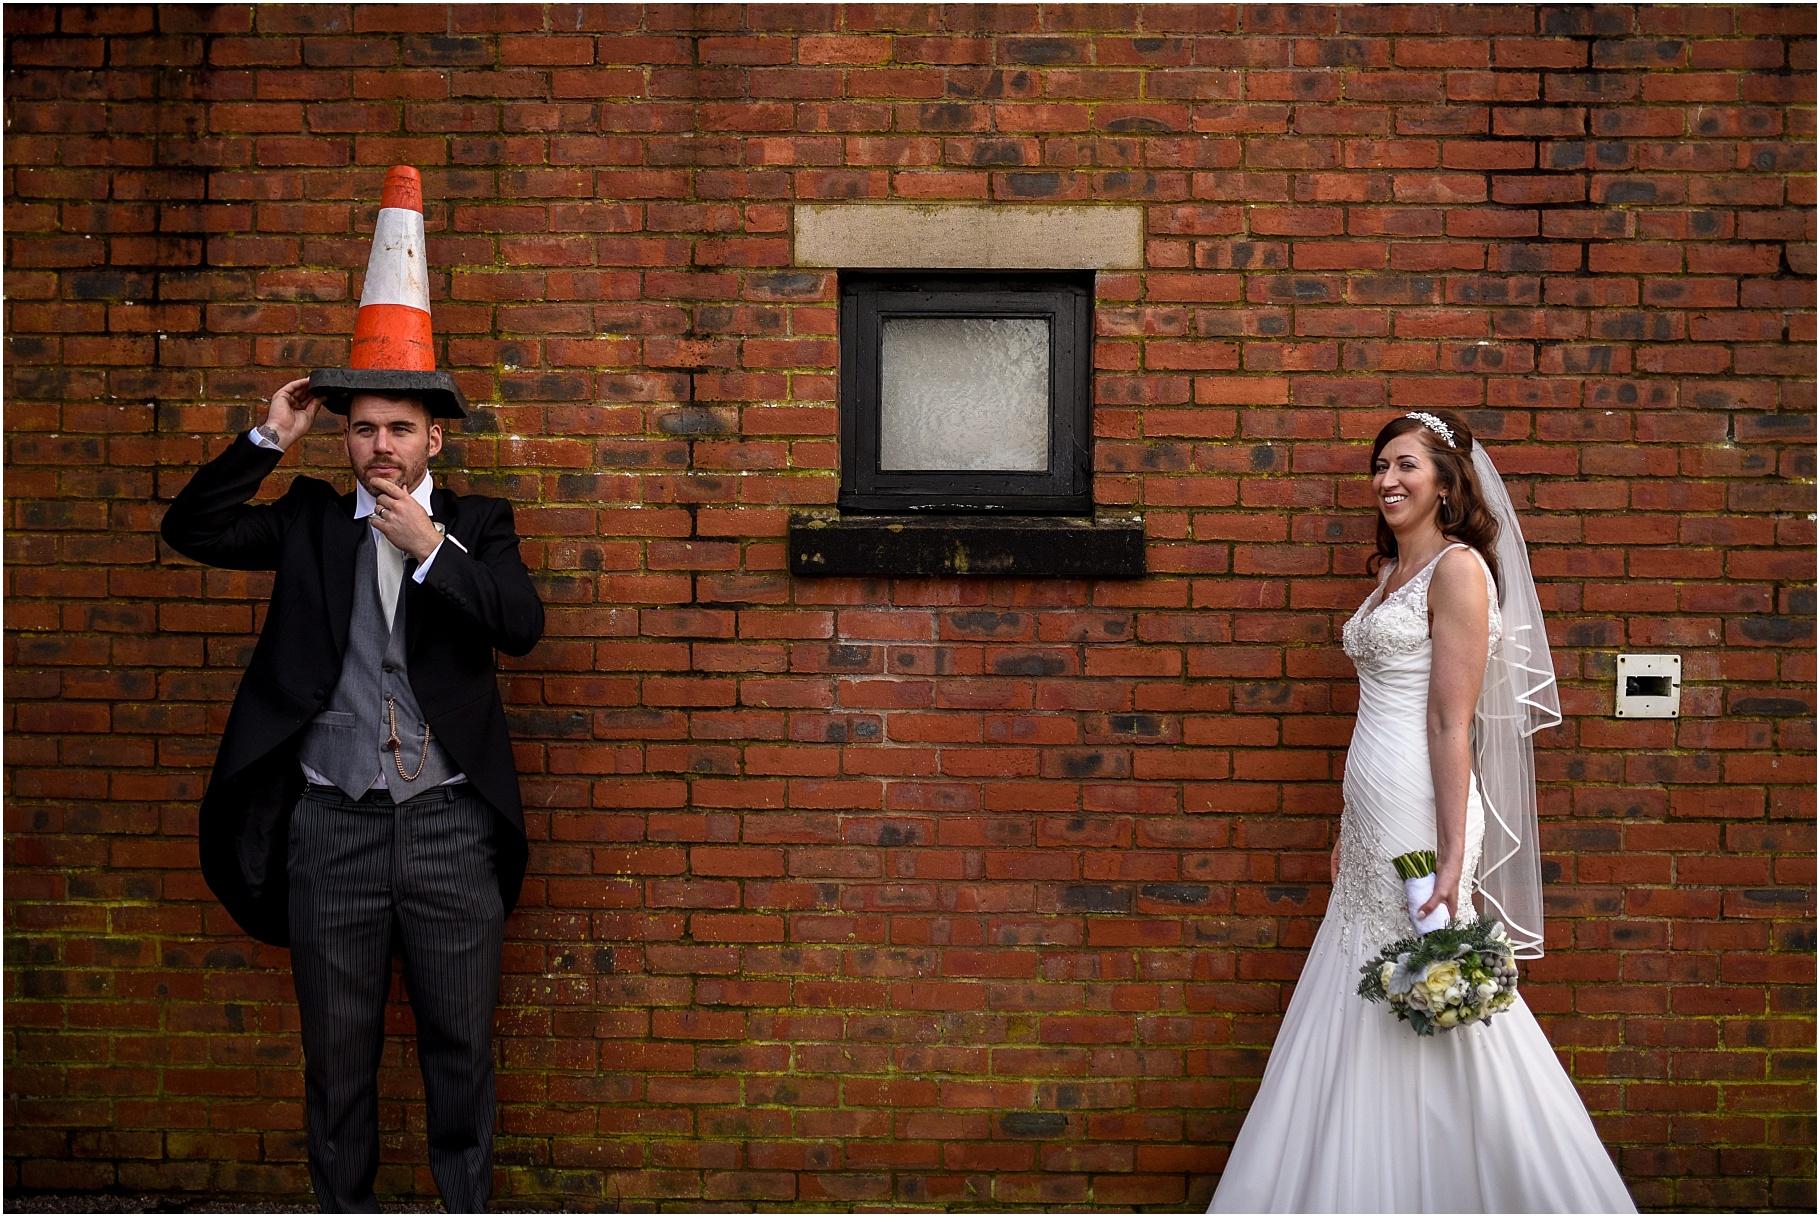 bartle-hall-wedding-41.jpg